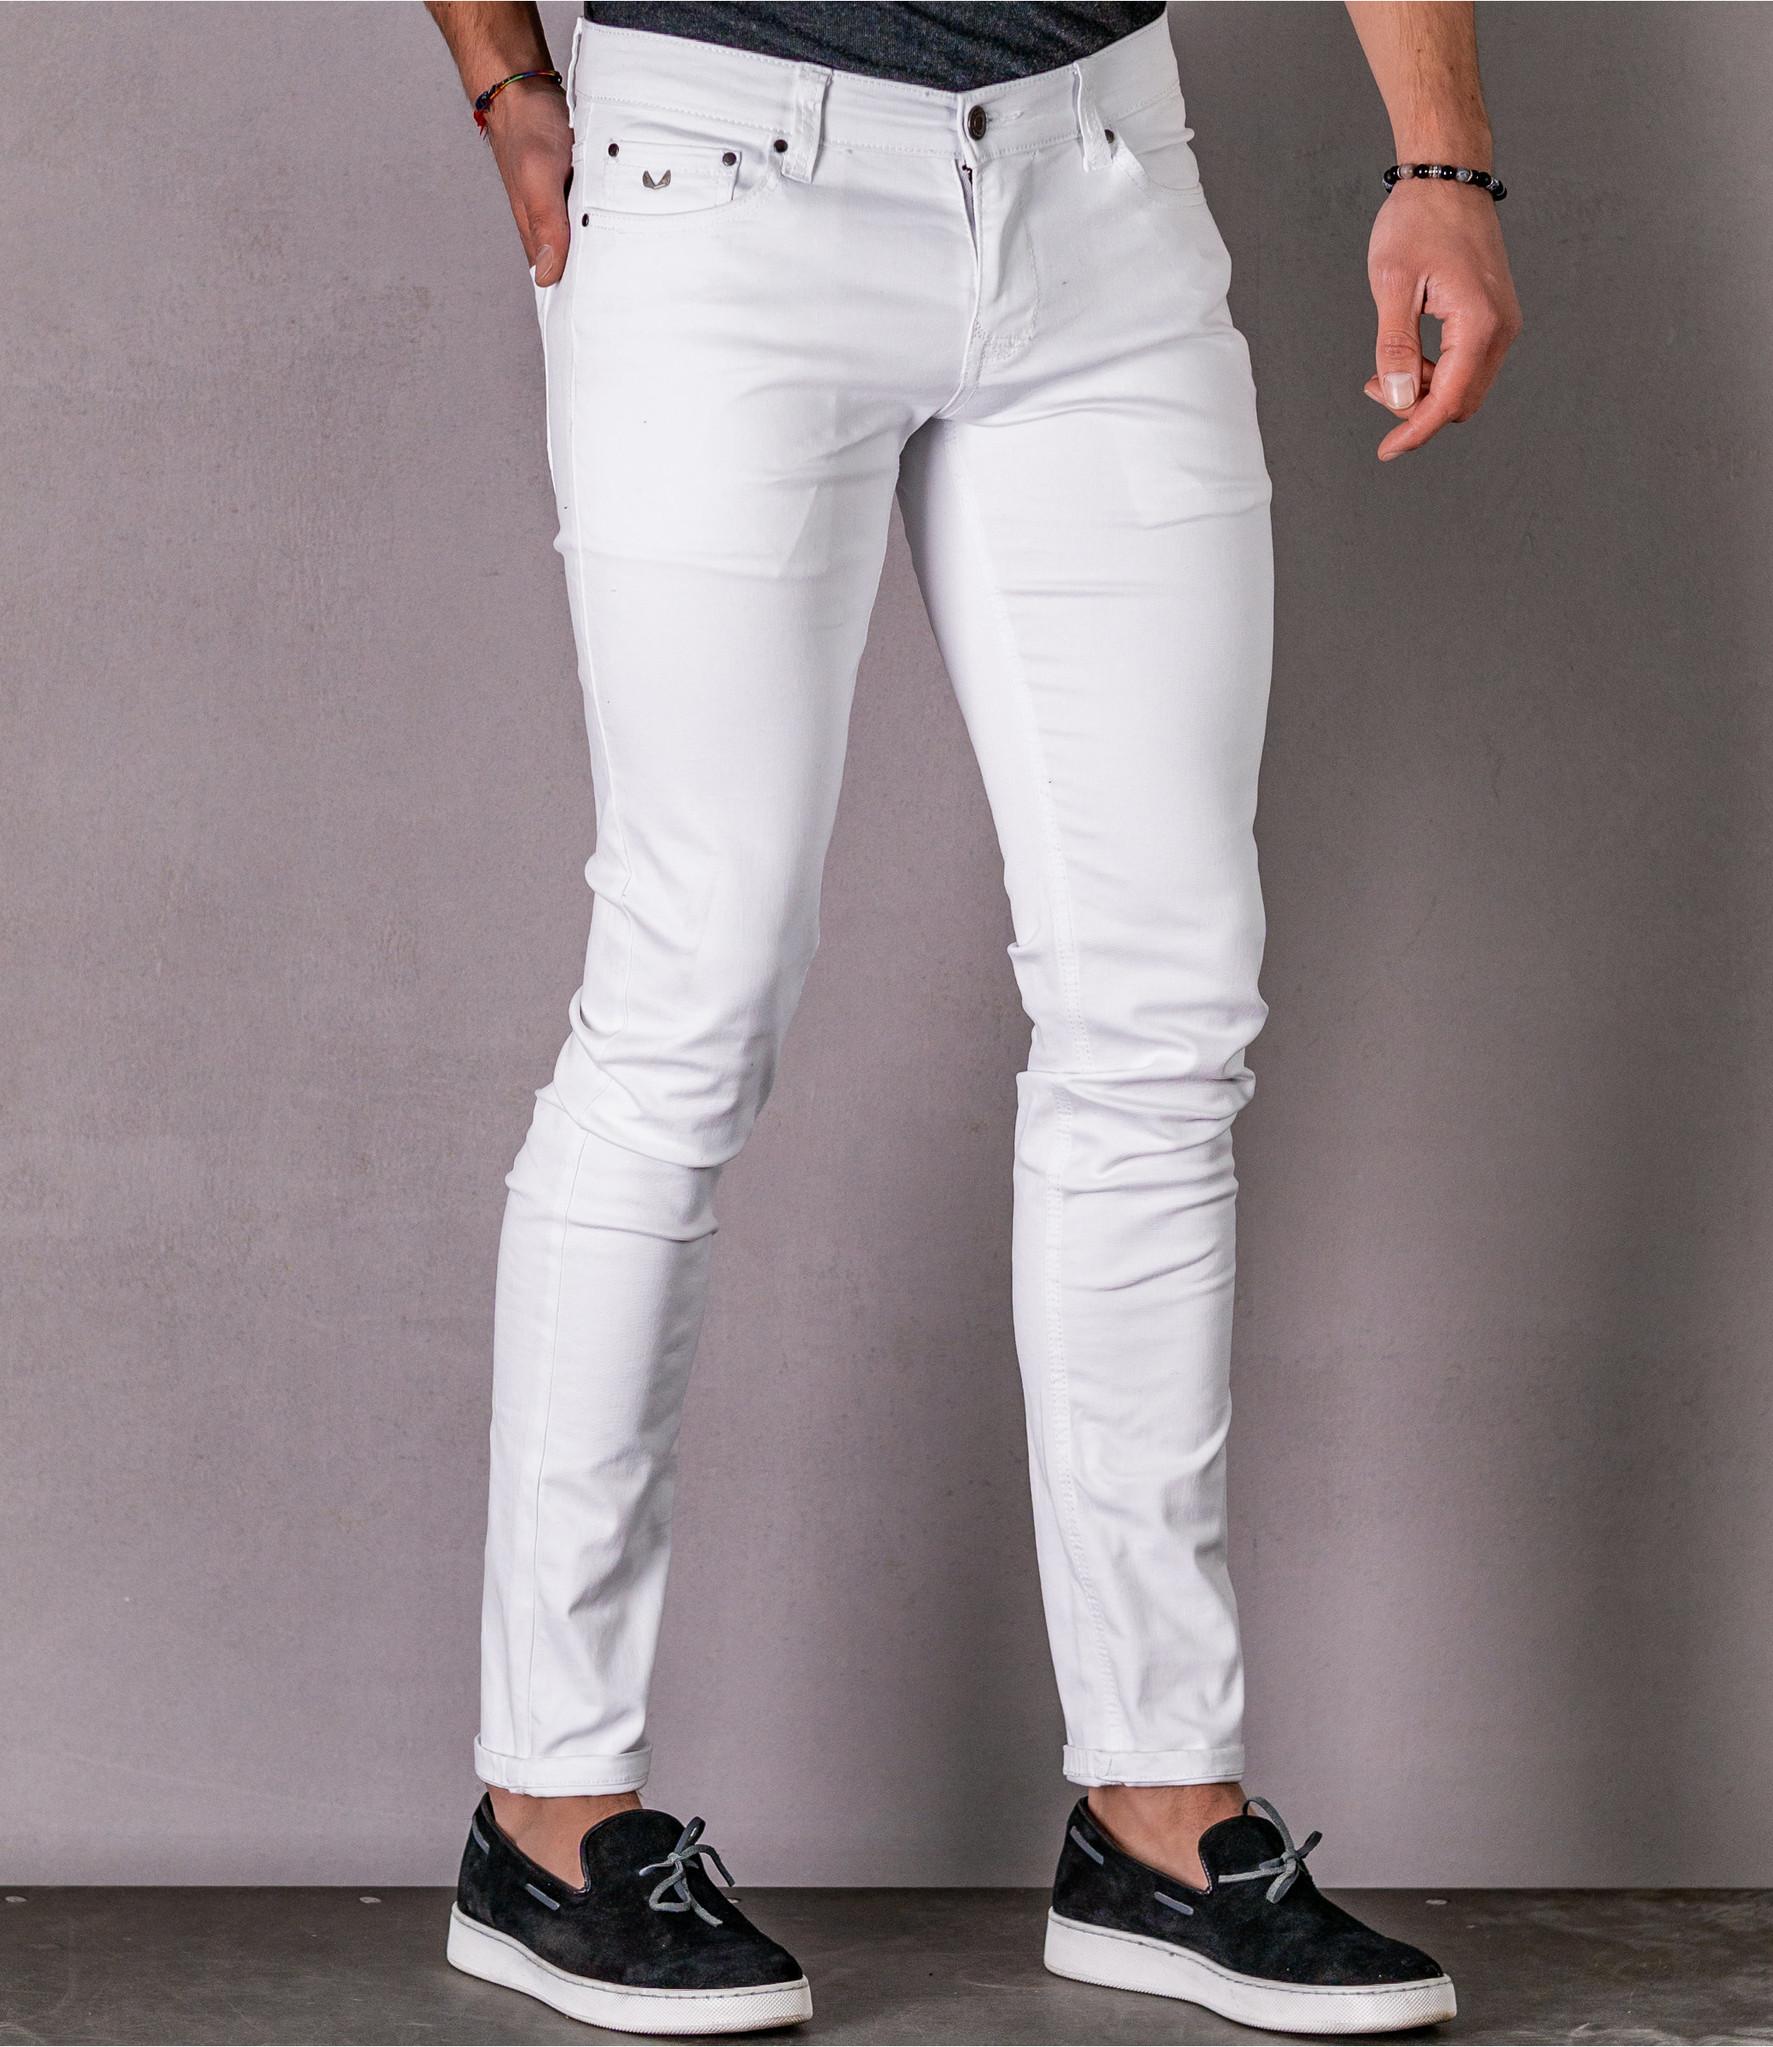 Zumo Skinny Fit Jeans CLINT-12ML147 White